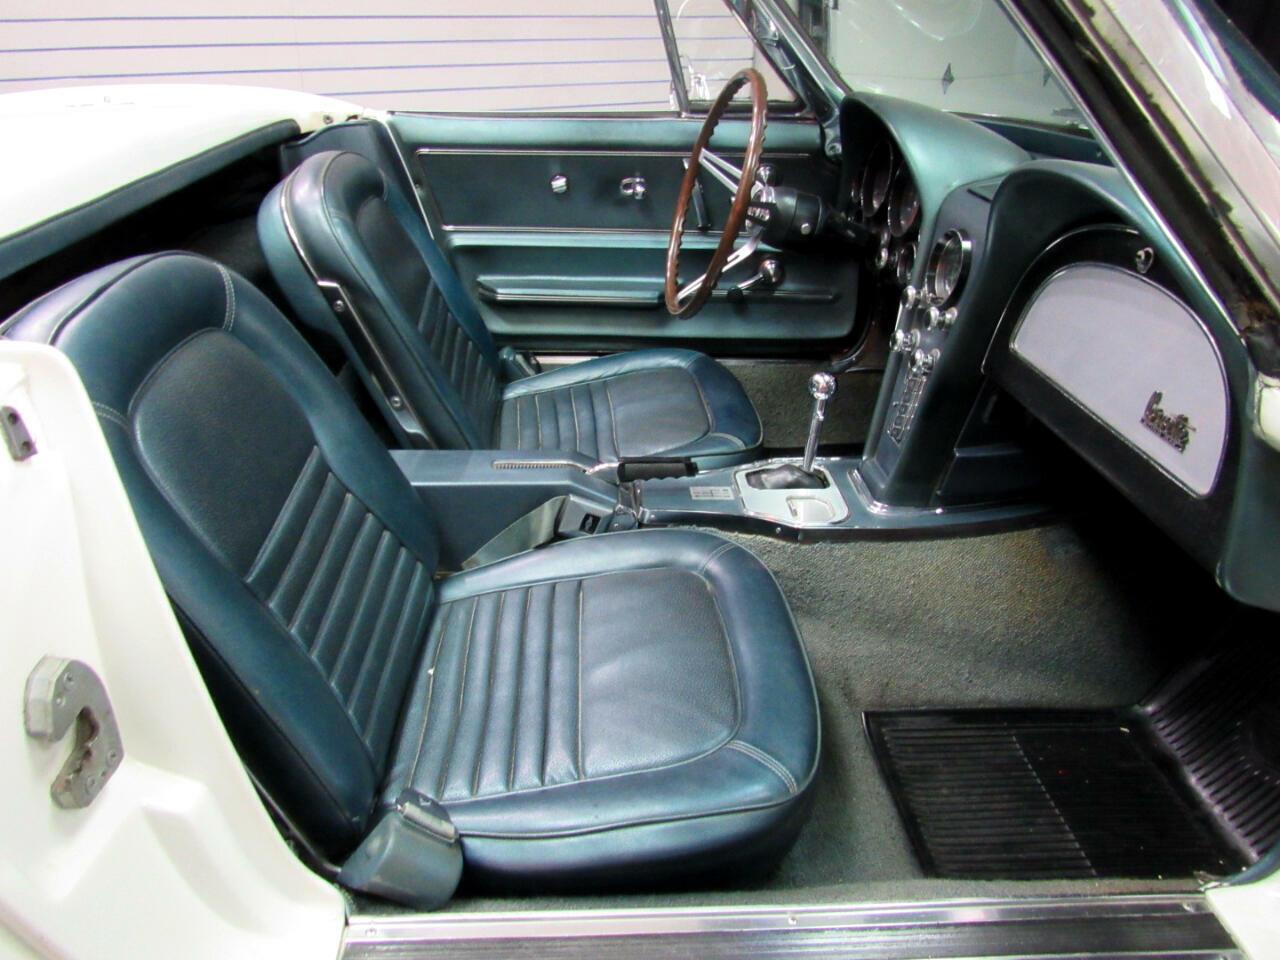 1967 White Chevrolet Corvette Convertible  | C2 Corvette Photo 10